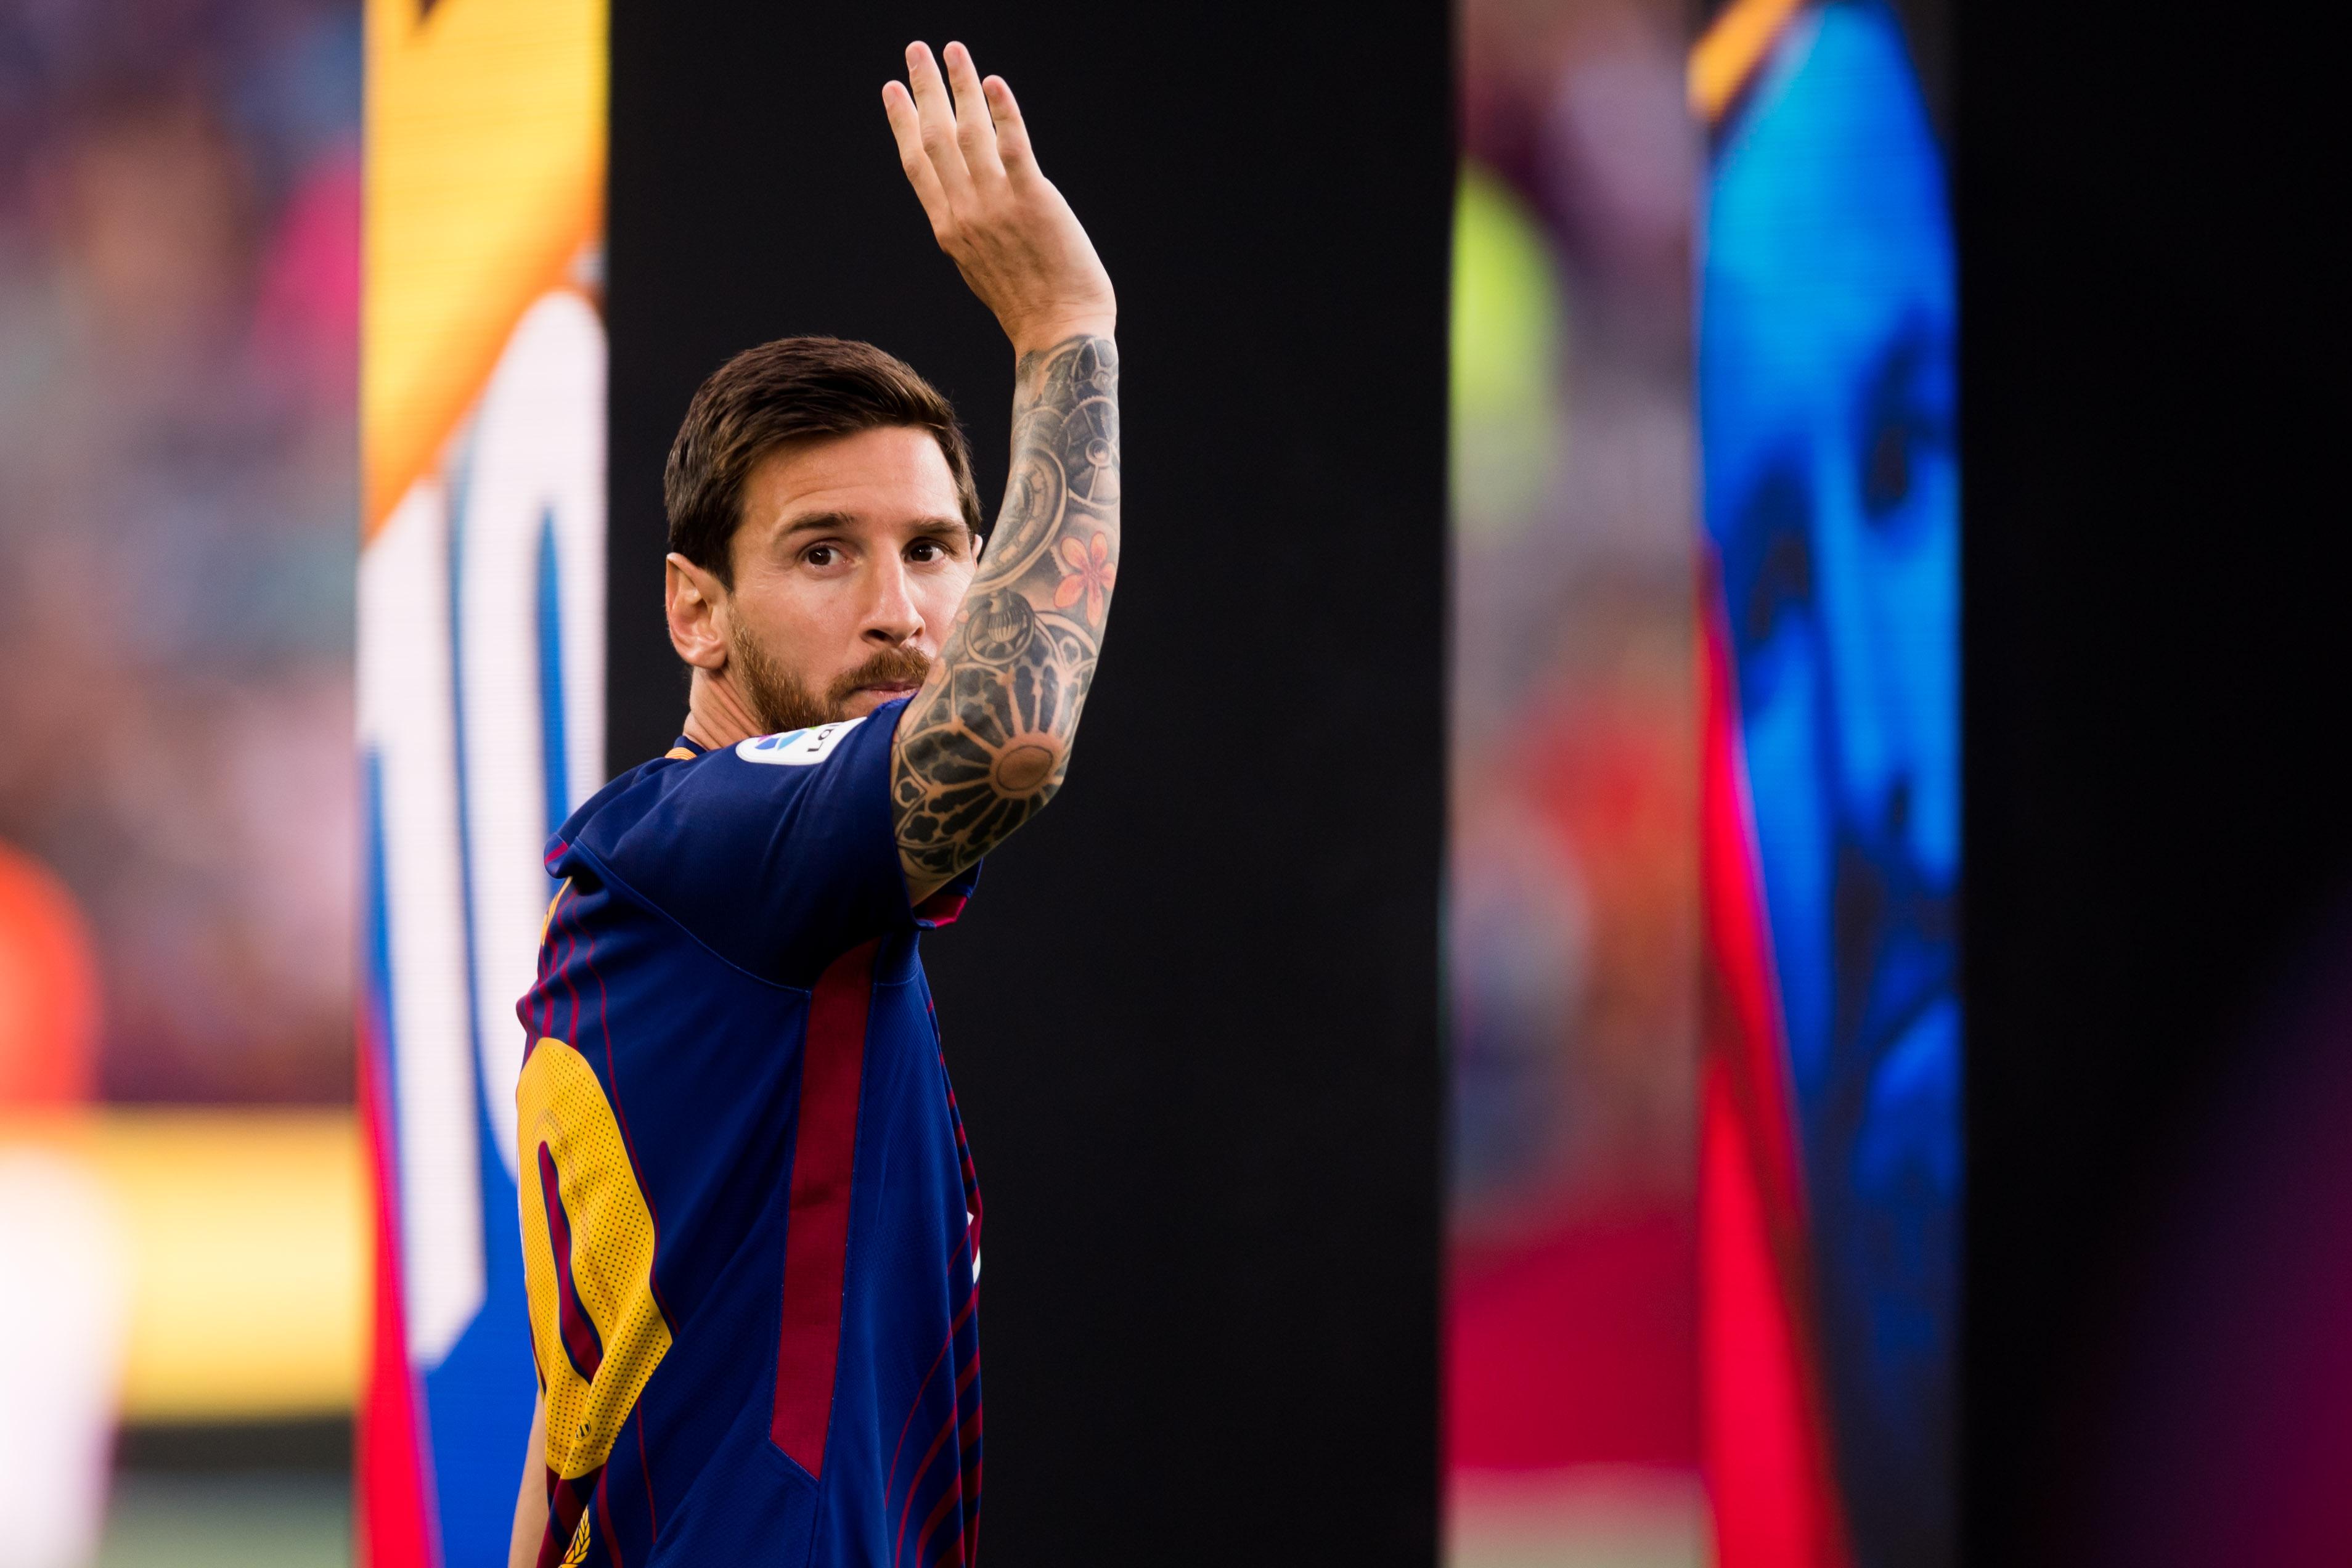 Messi, fútbol, Barcelona, gol, pase, Barça, soccer, football, delantero, striker, goal